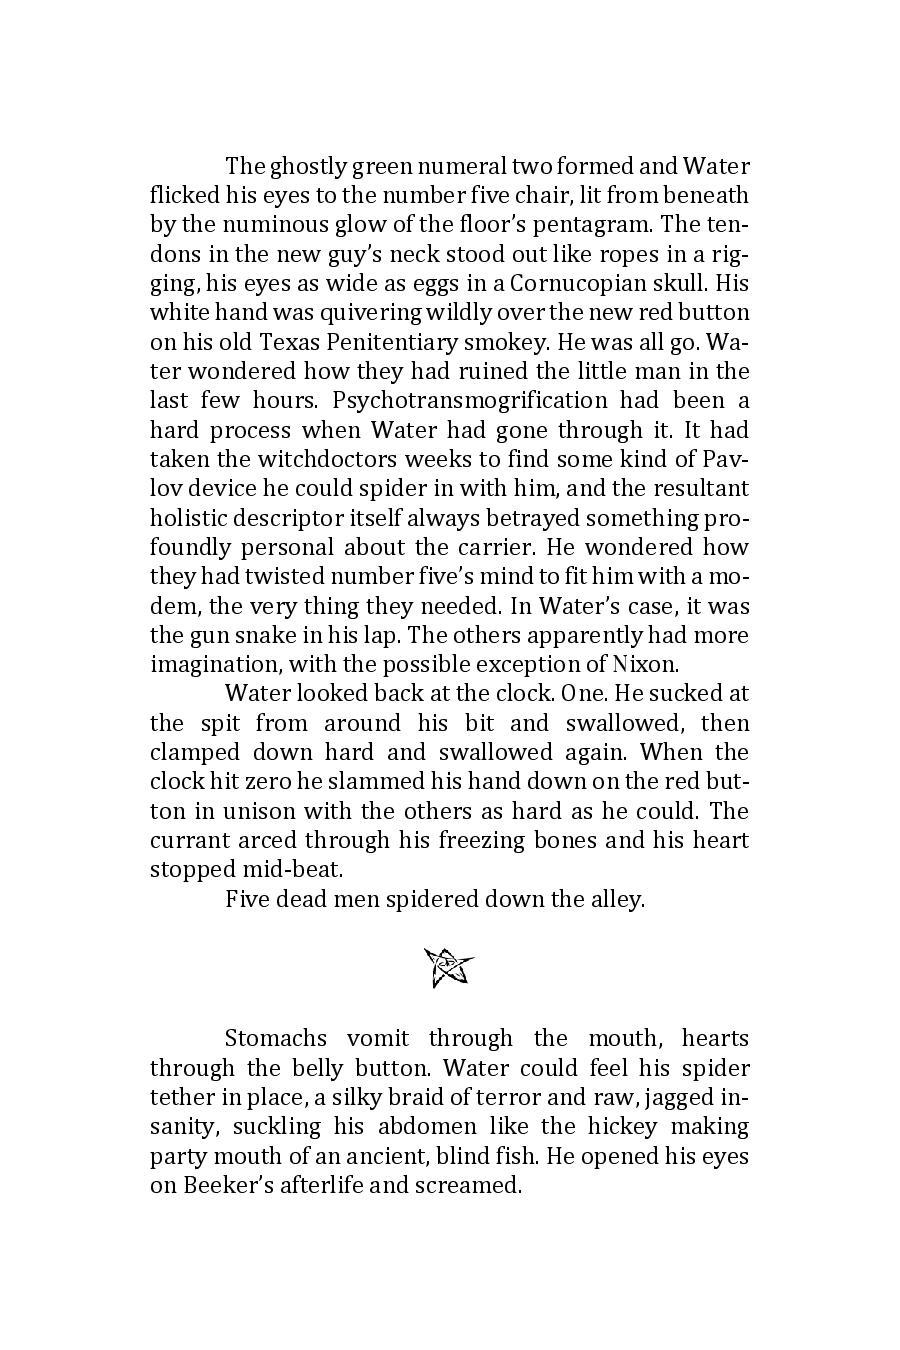 Hinnom Magazine 002 Manuscript E-Book 2-page-177